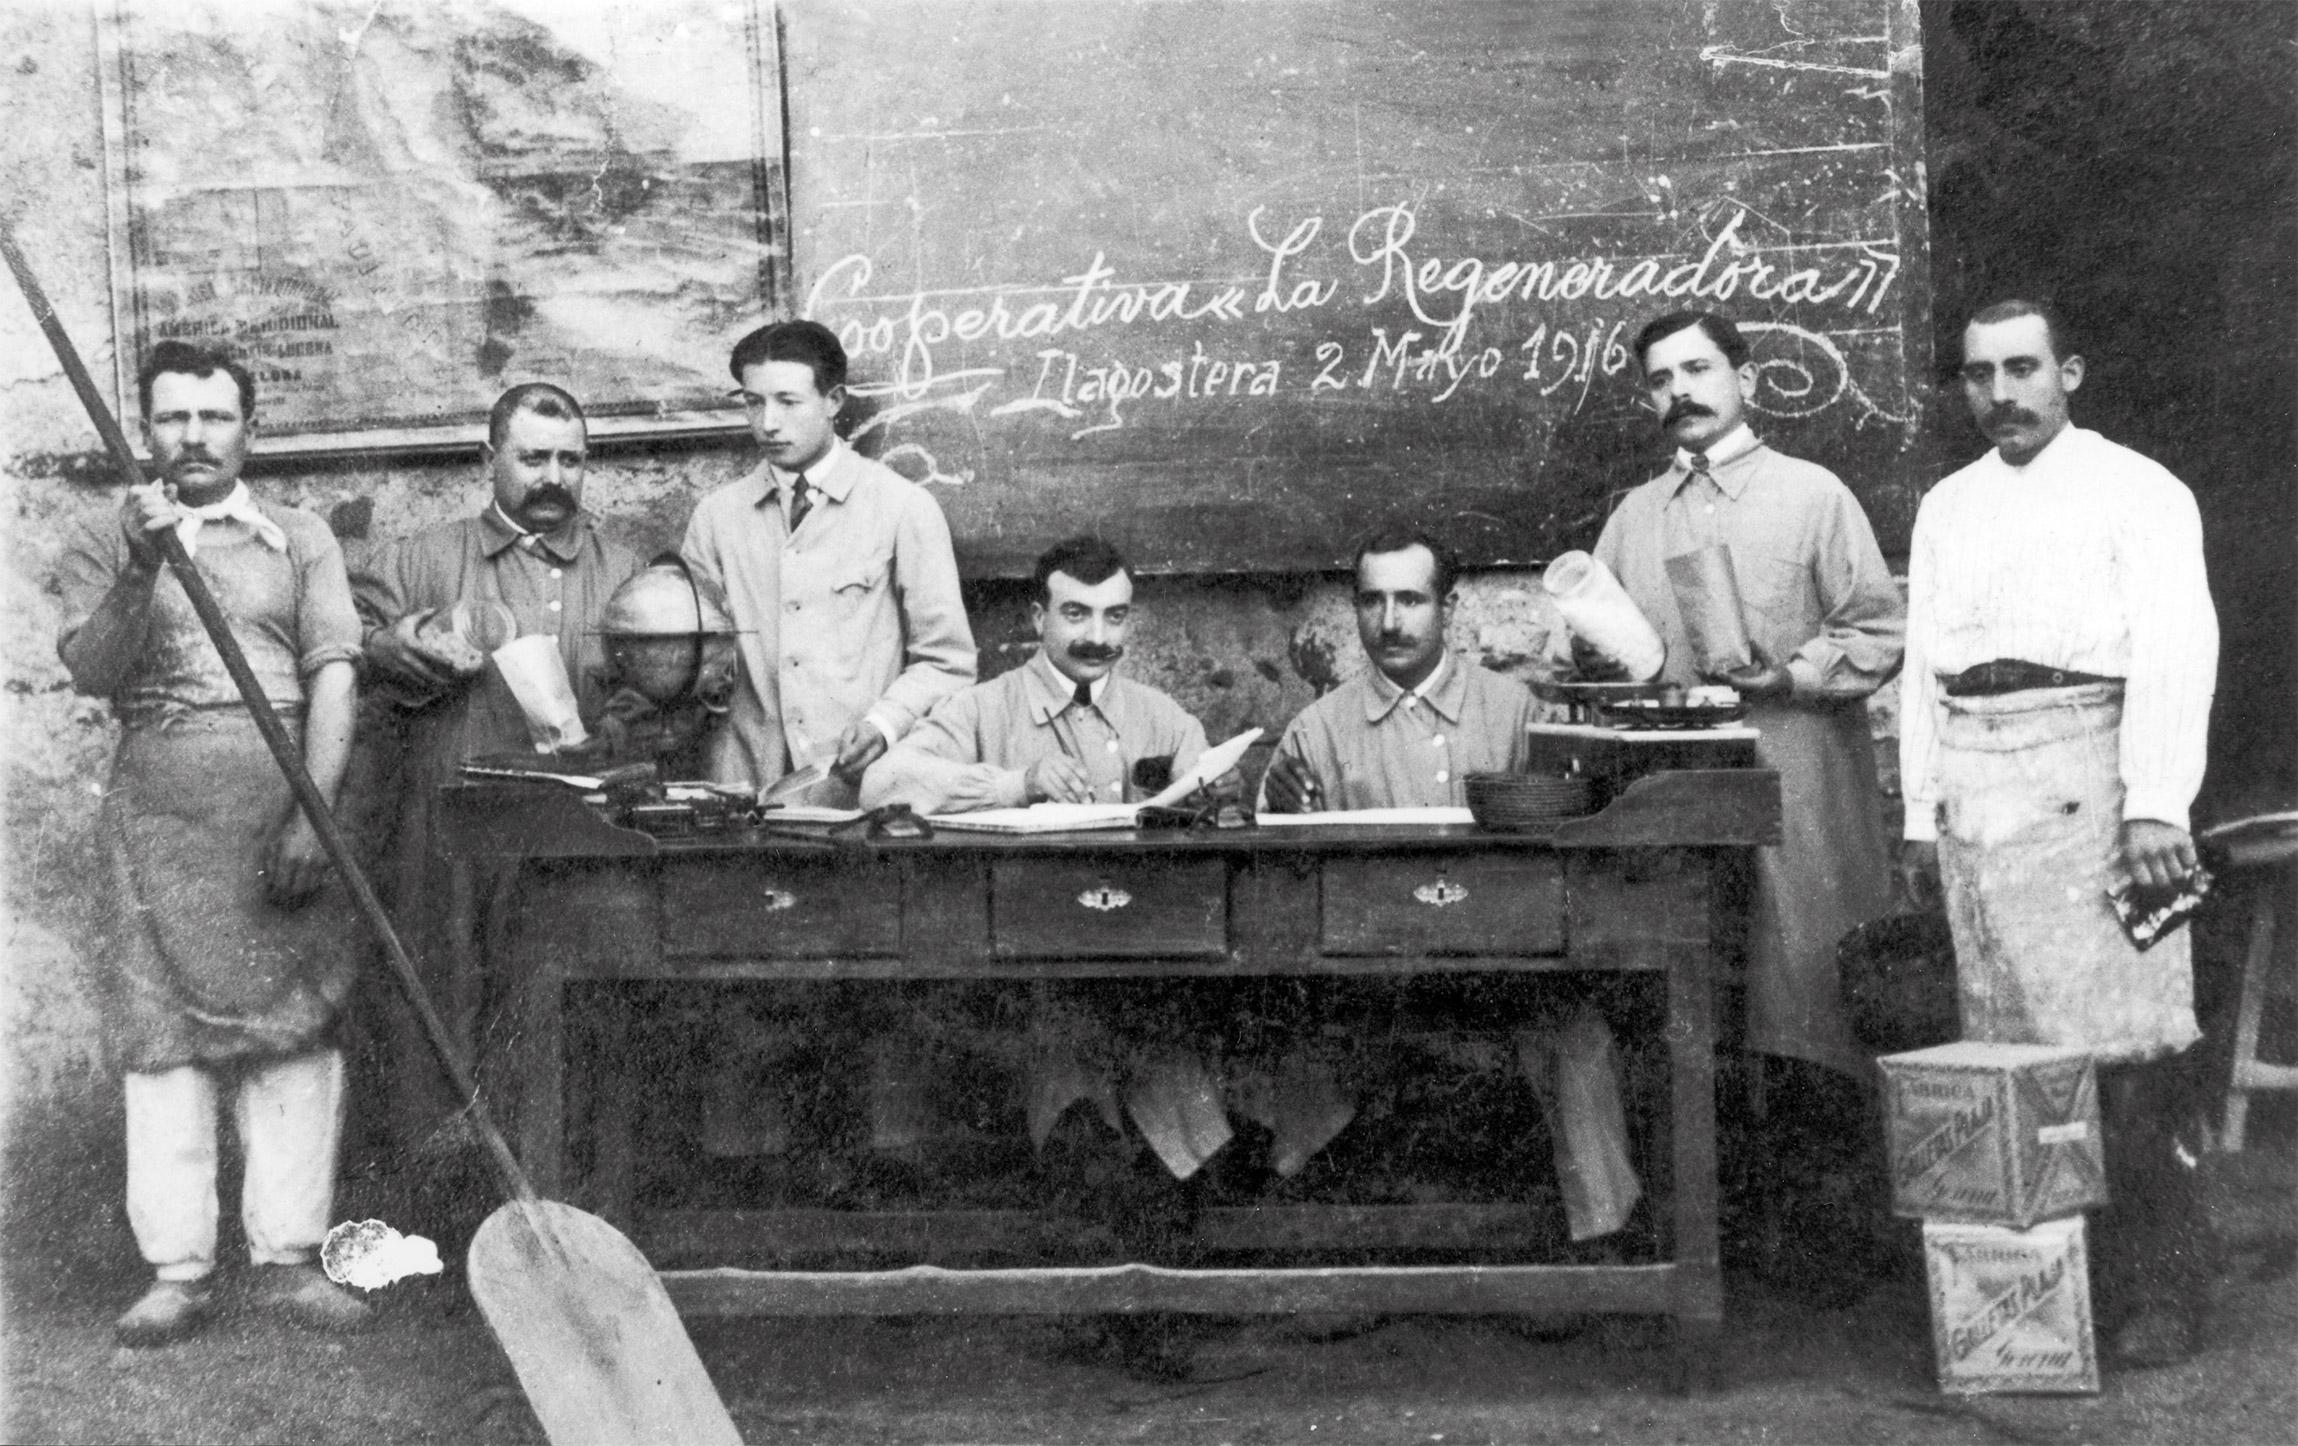 Personal de la Cooperativa La Regeneradora de Llagostera